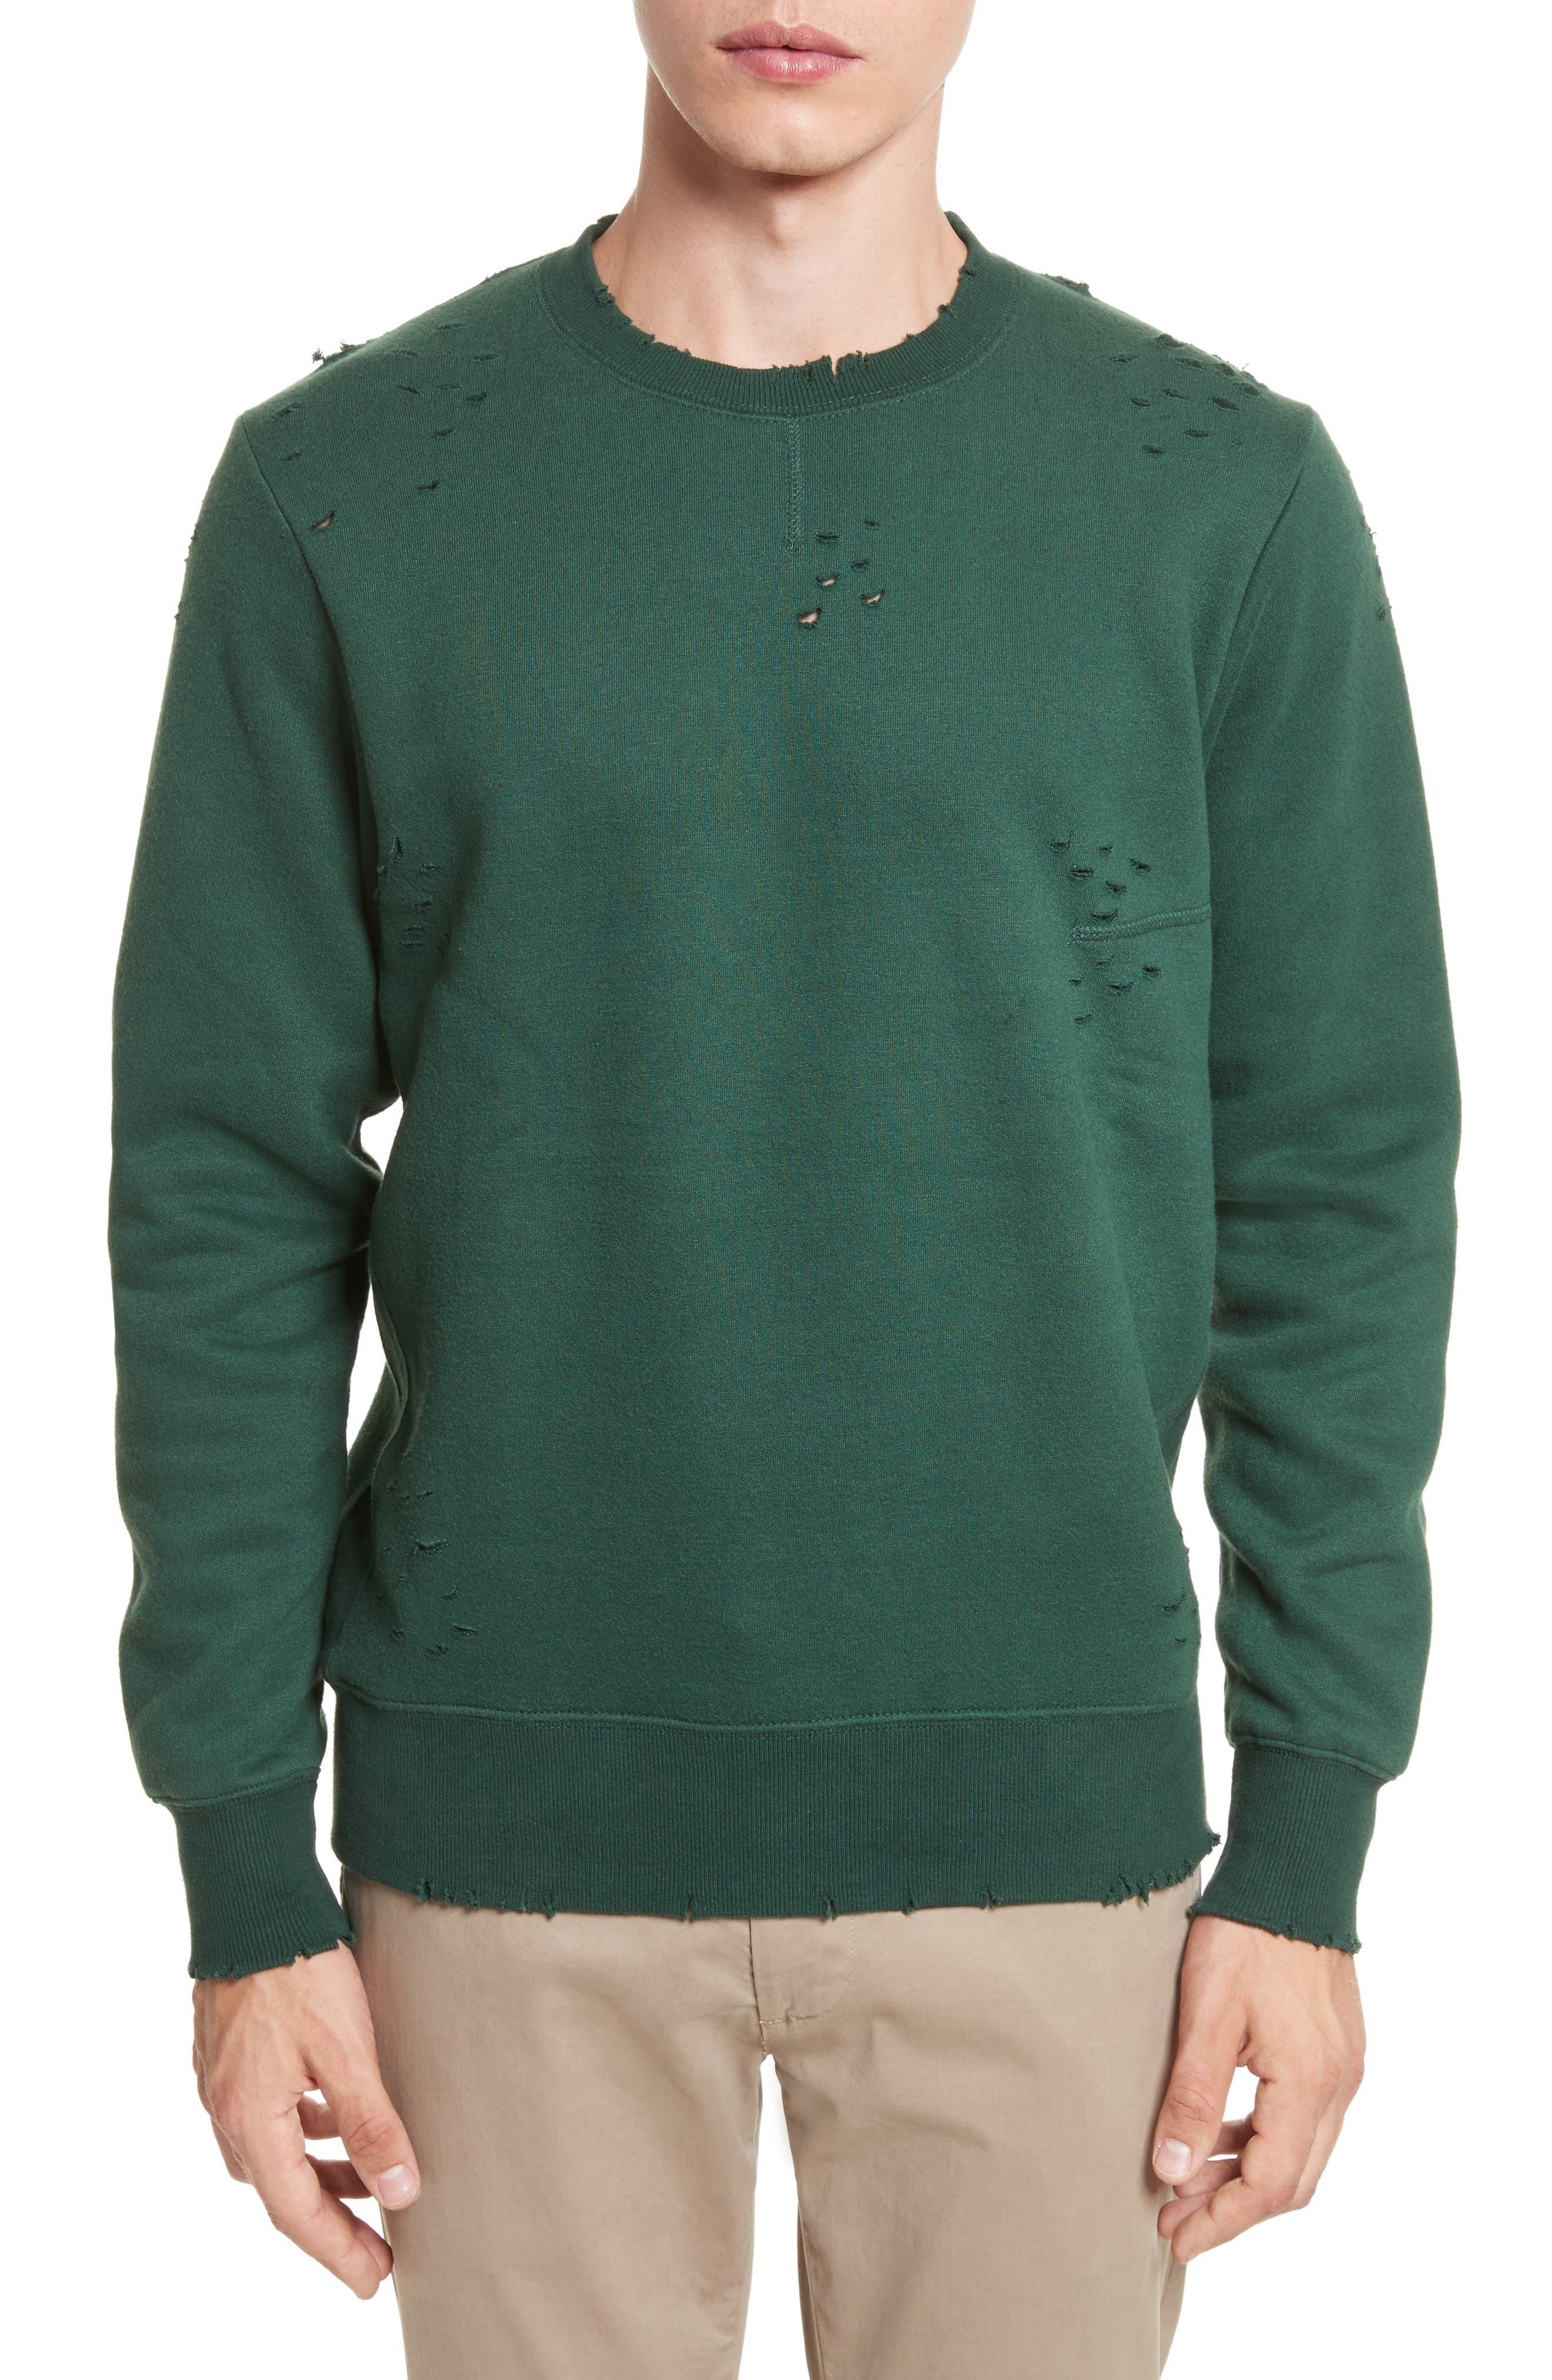 Alternate Image 1 Selected - OVADIA & SONS Crewneck Sweater